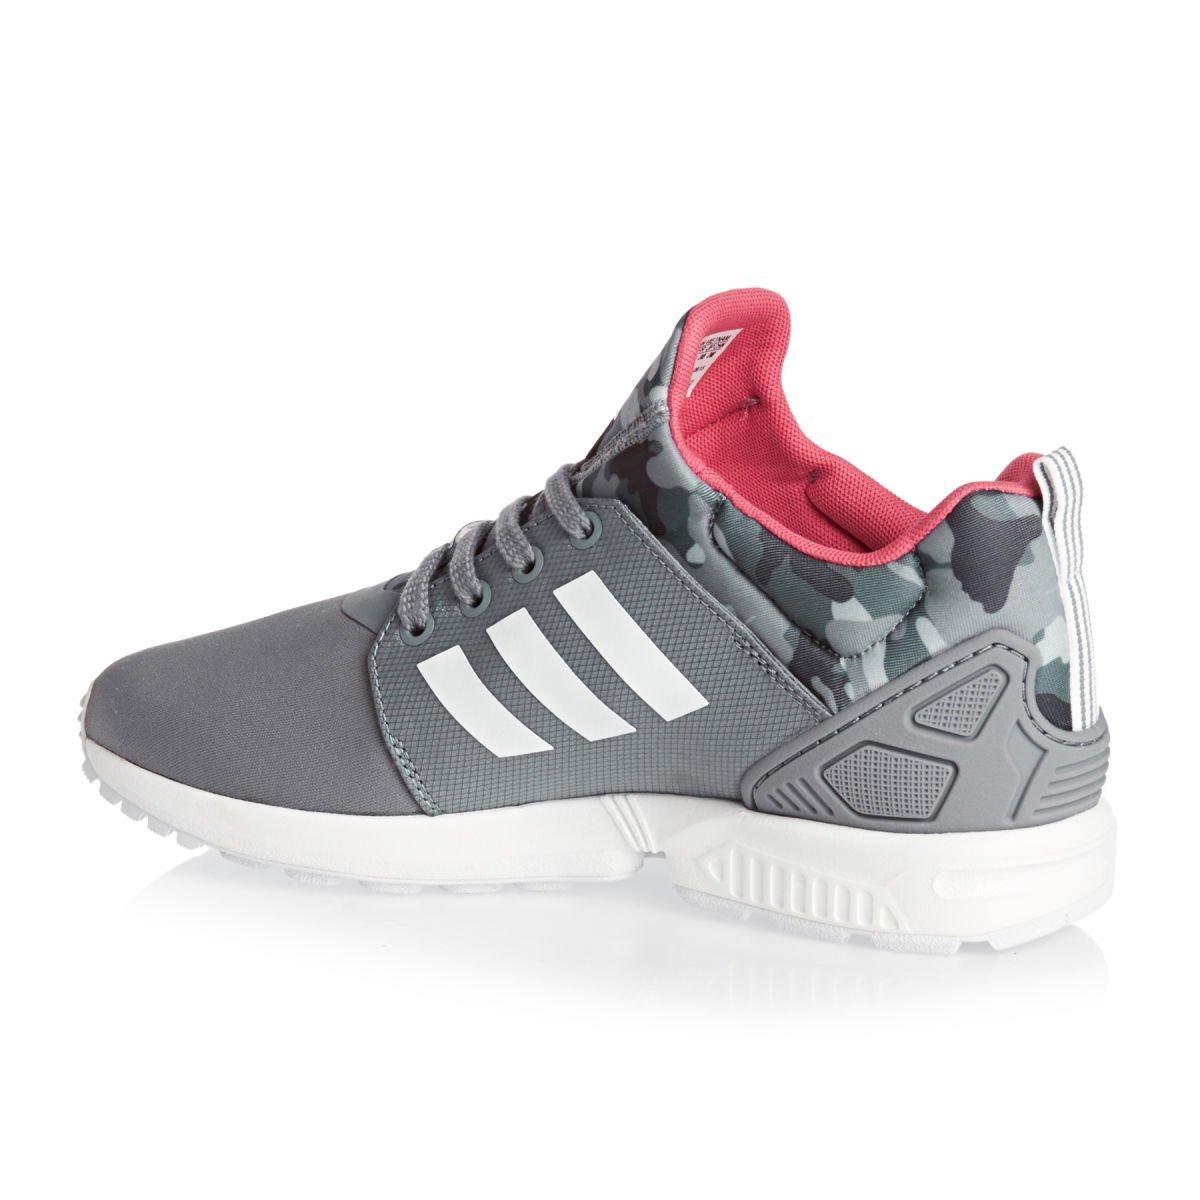 Adidas Zx Flux Flux Flux Nps Updt W, gris / blanco / rosa 937b97